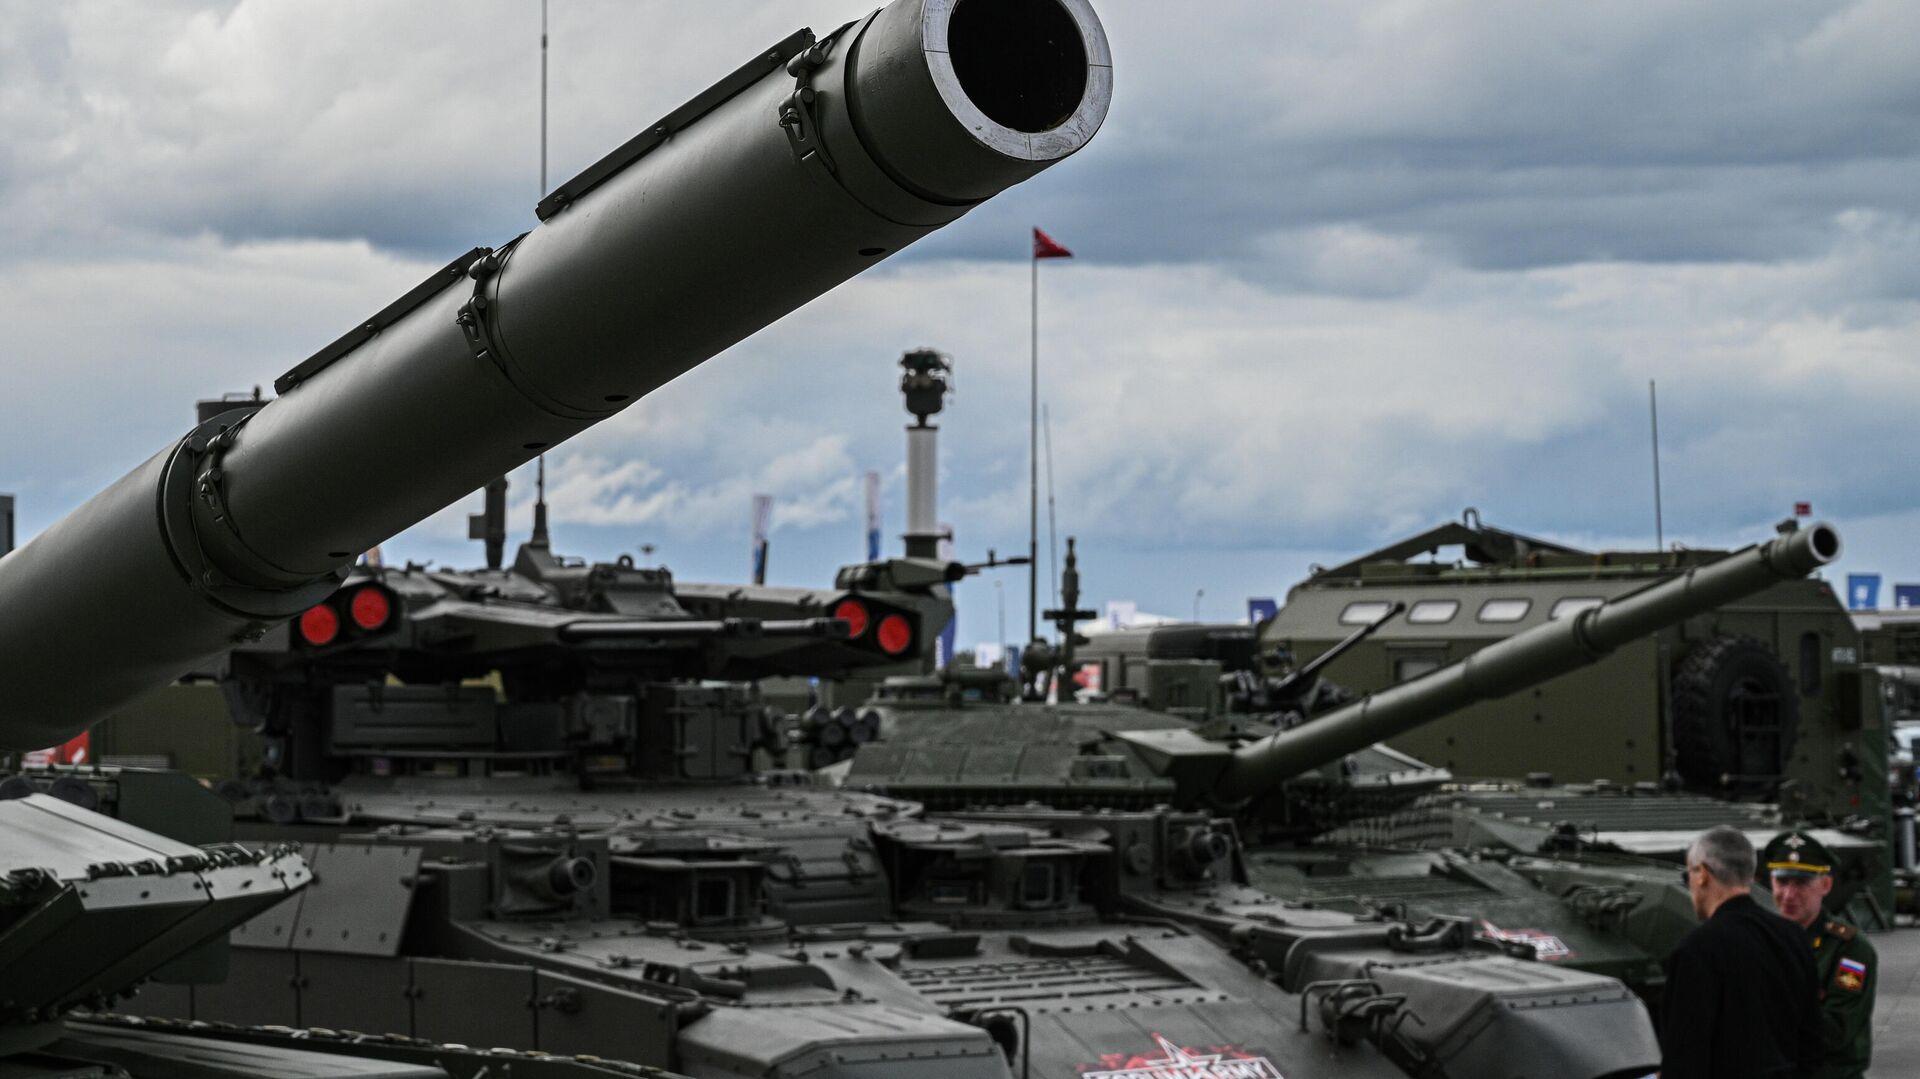 Tanques en la feria internacional de defensa Army 2021 - Sputnik Mundo, 1920, 25.08.2021